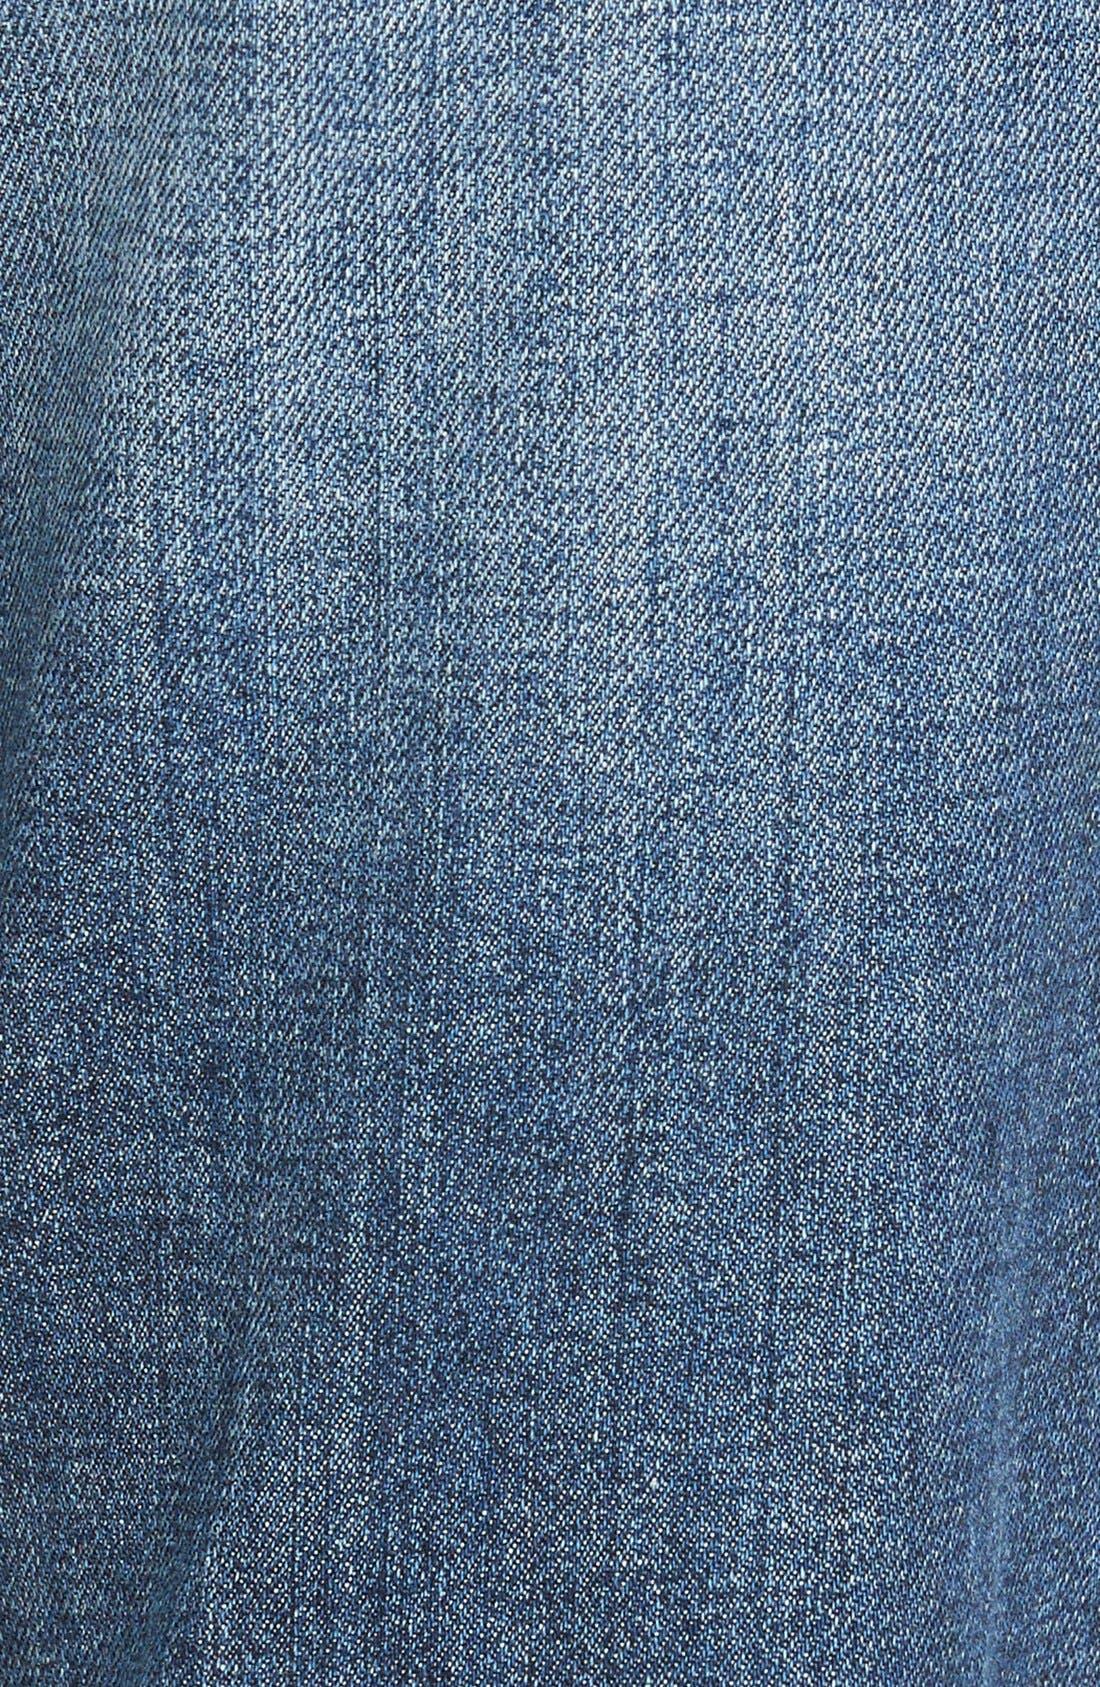 Alternate Image 5  - Joes Jeans Debbie High Waist Ripped Boyfriend Jeans (Coppola)